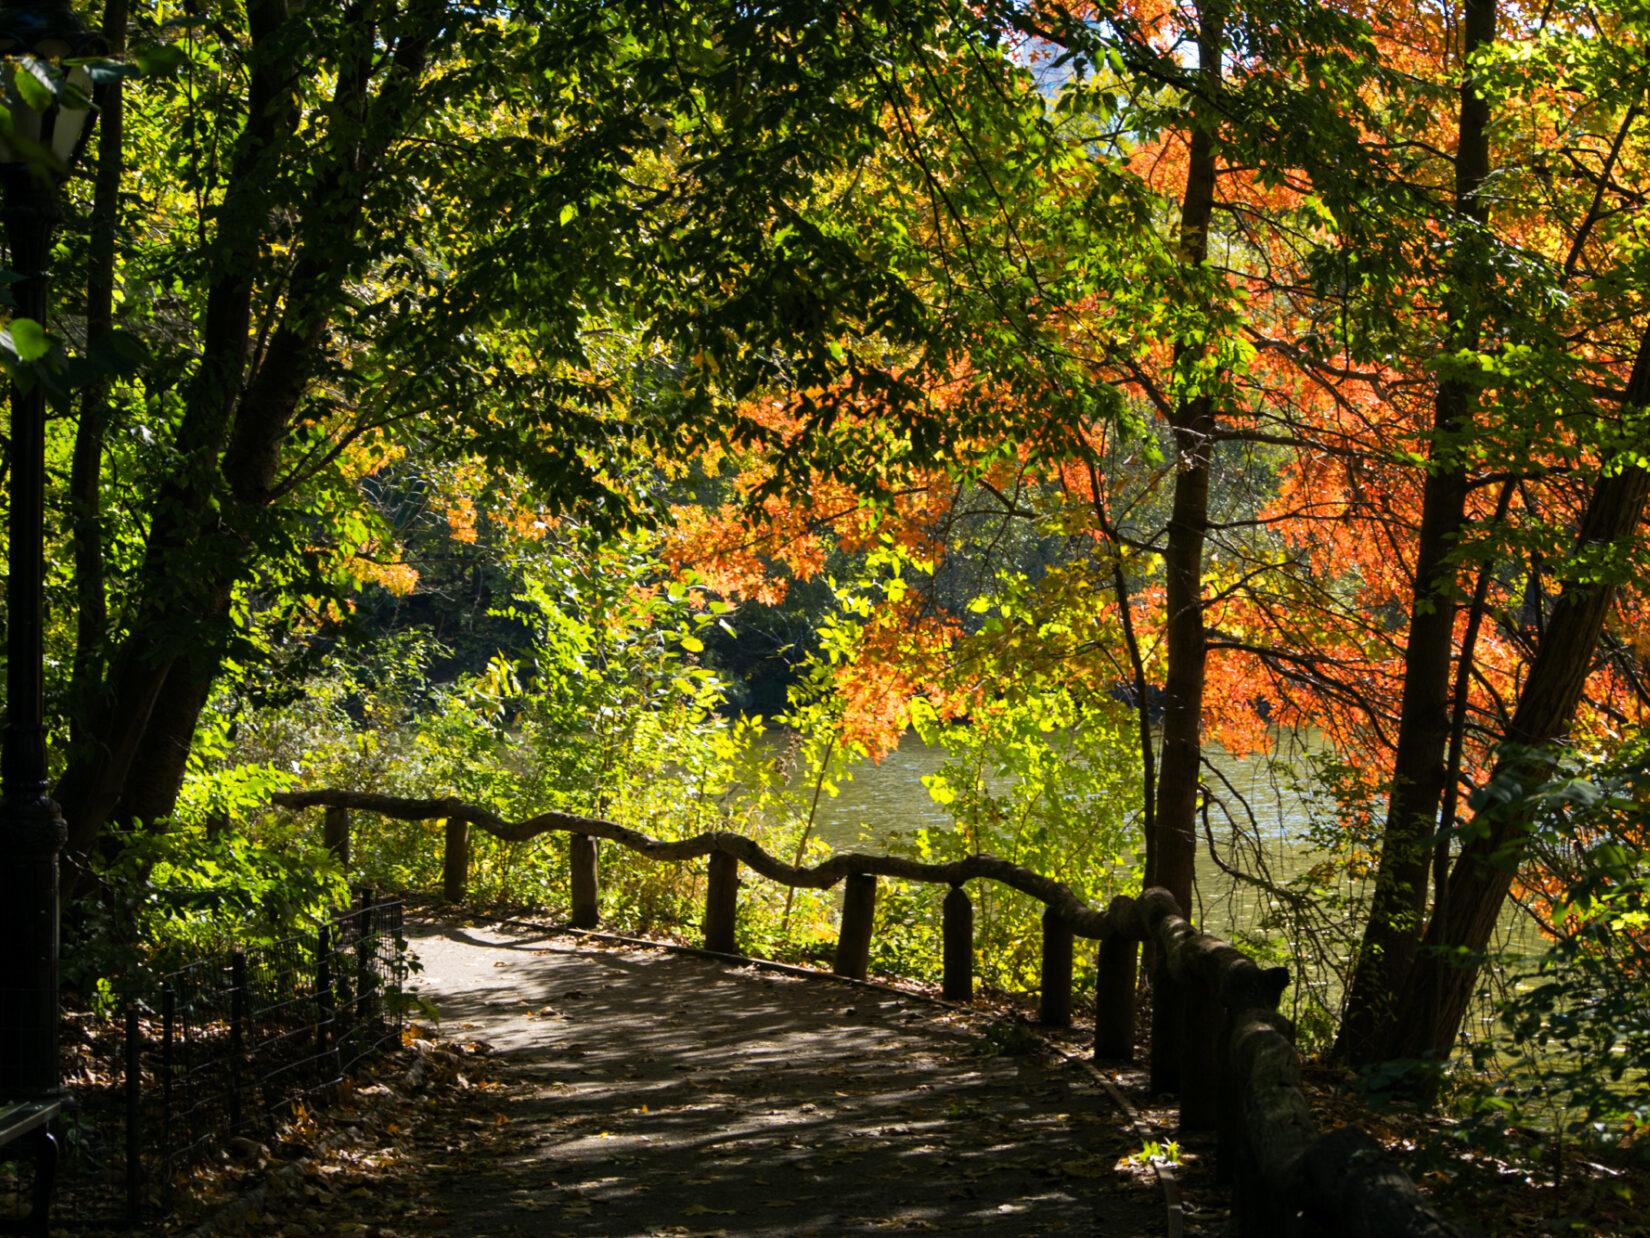 A path through the Ramble